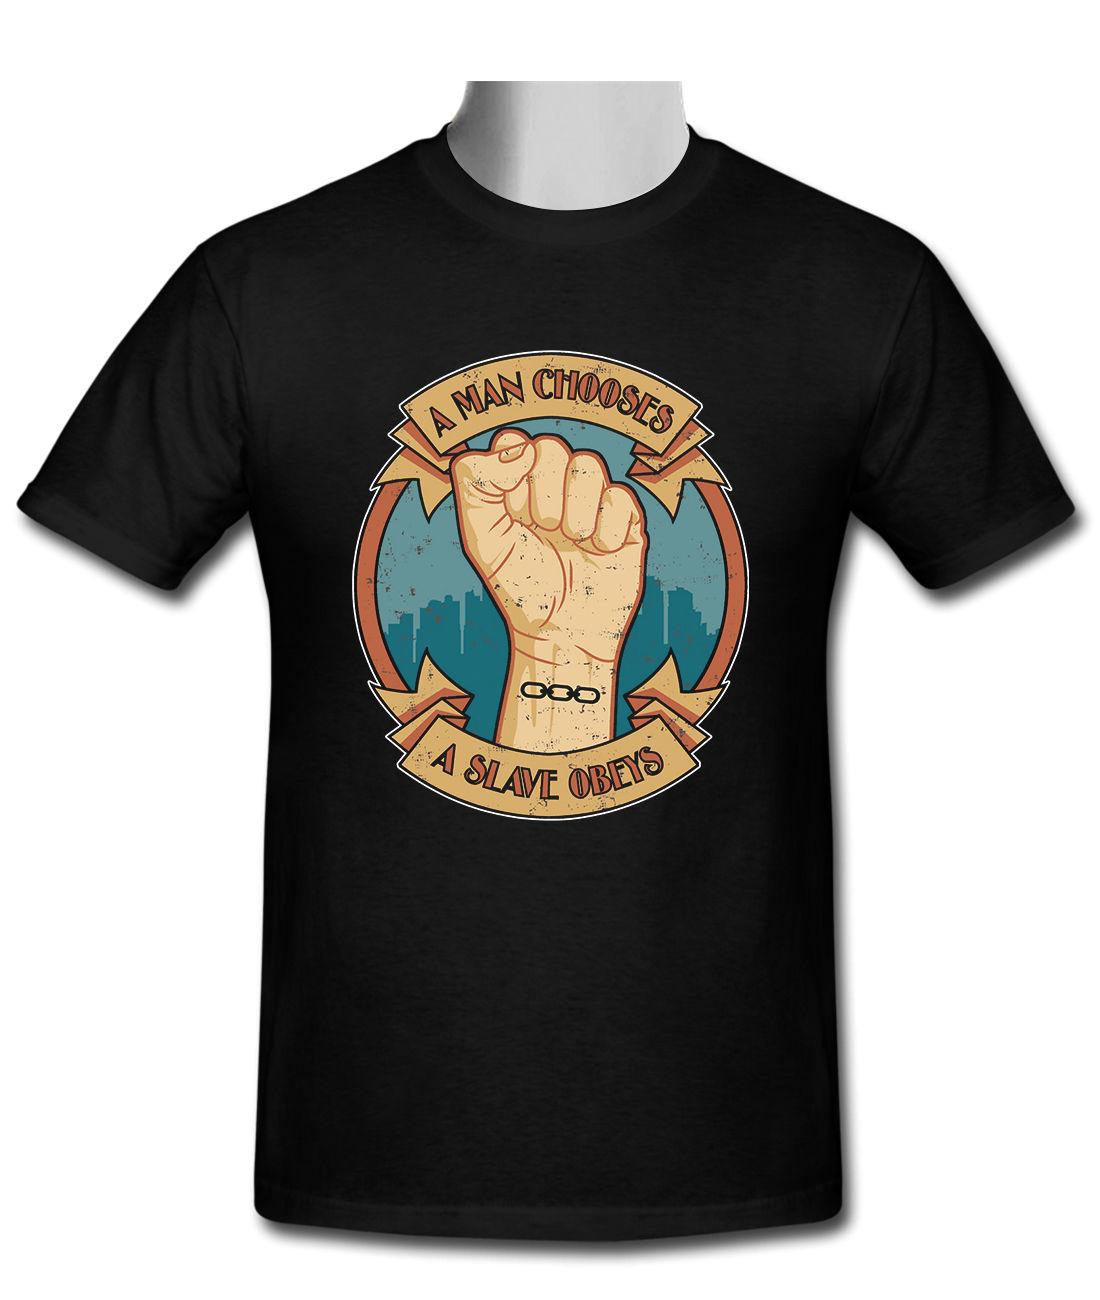 Good quality black t shirt - 2017 A Man Chooses A Slave Obeys Men S Custom Black T Shirt Size S 2xl T Shirt Good Quality T Shirt Tops